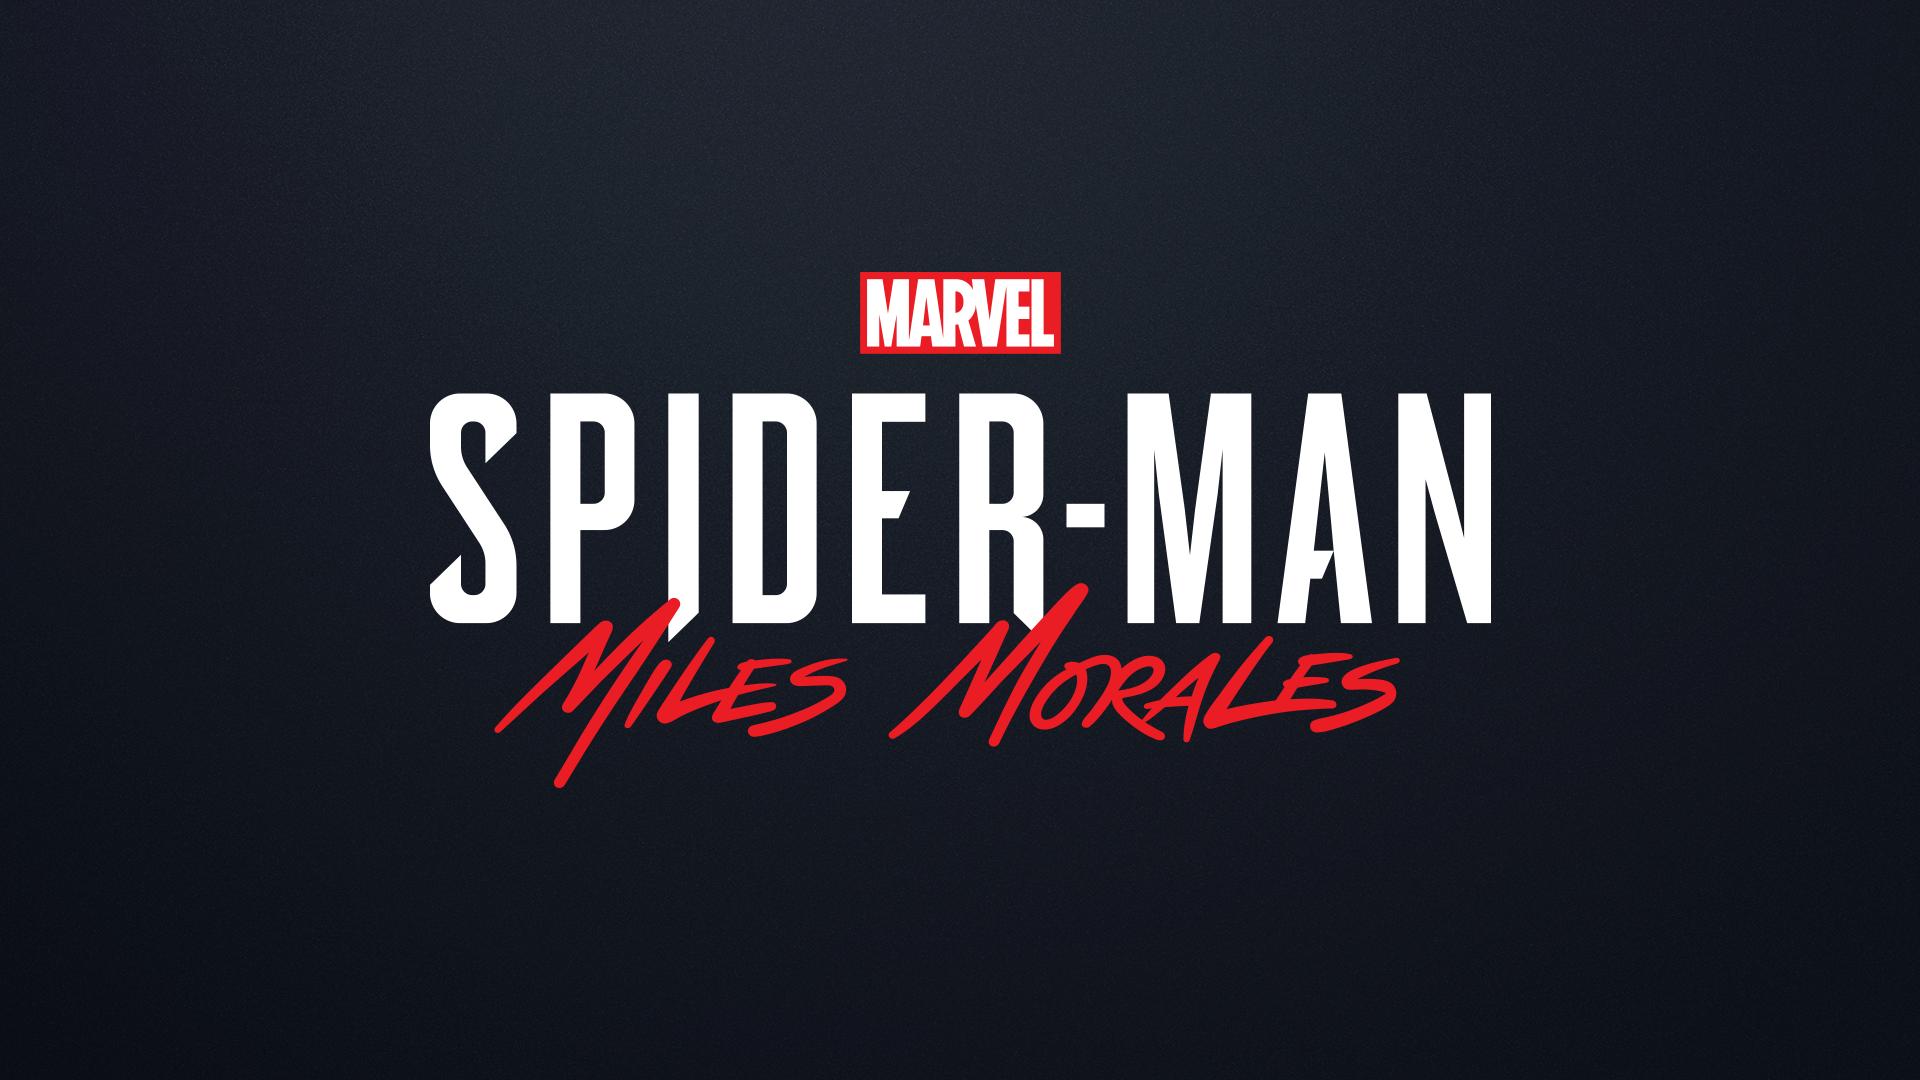 Spiderman logo image